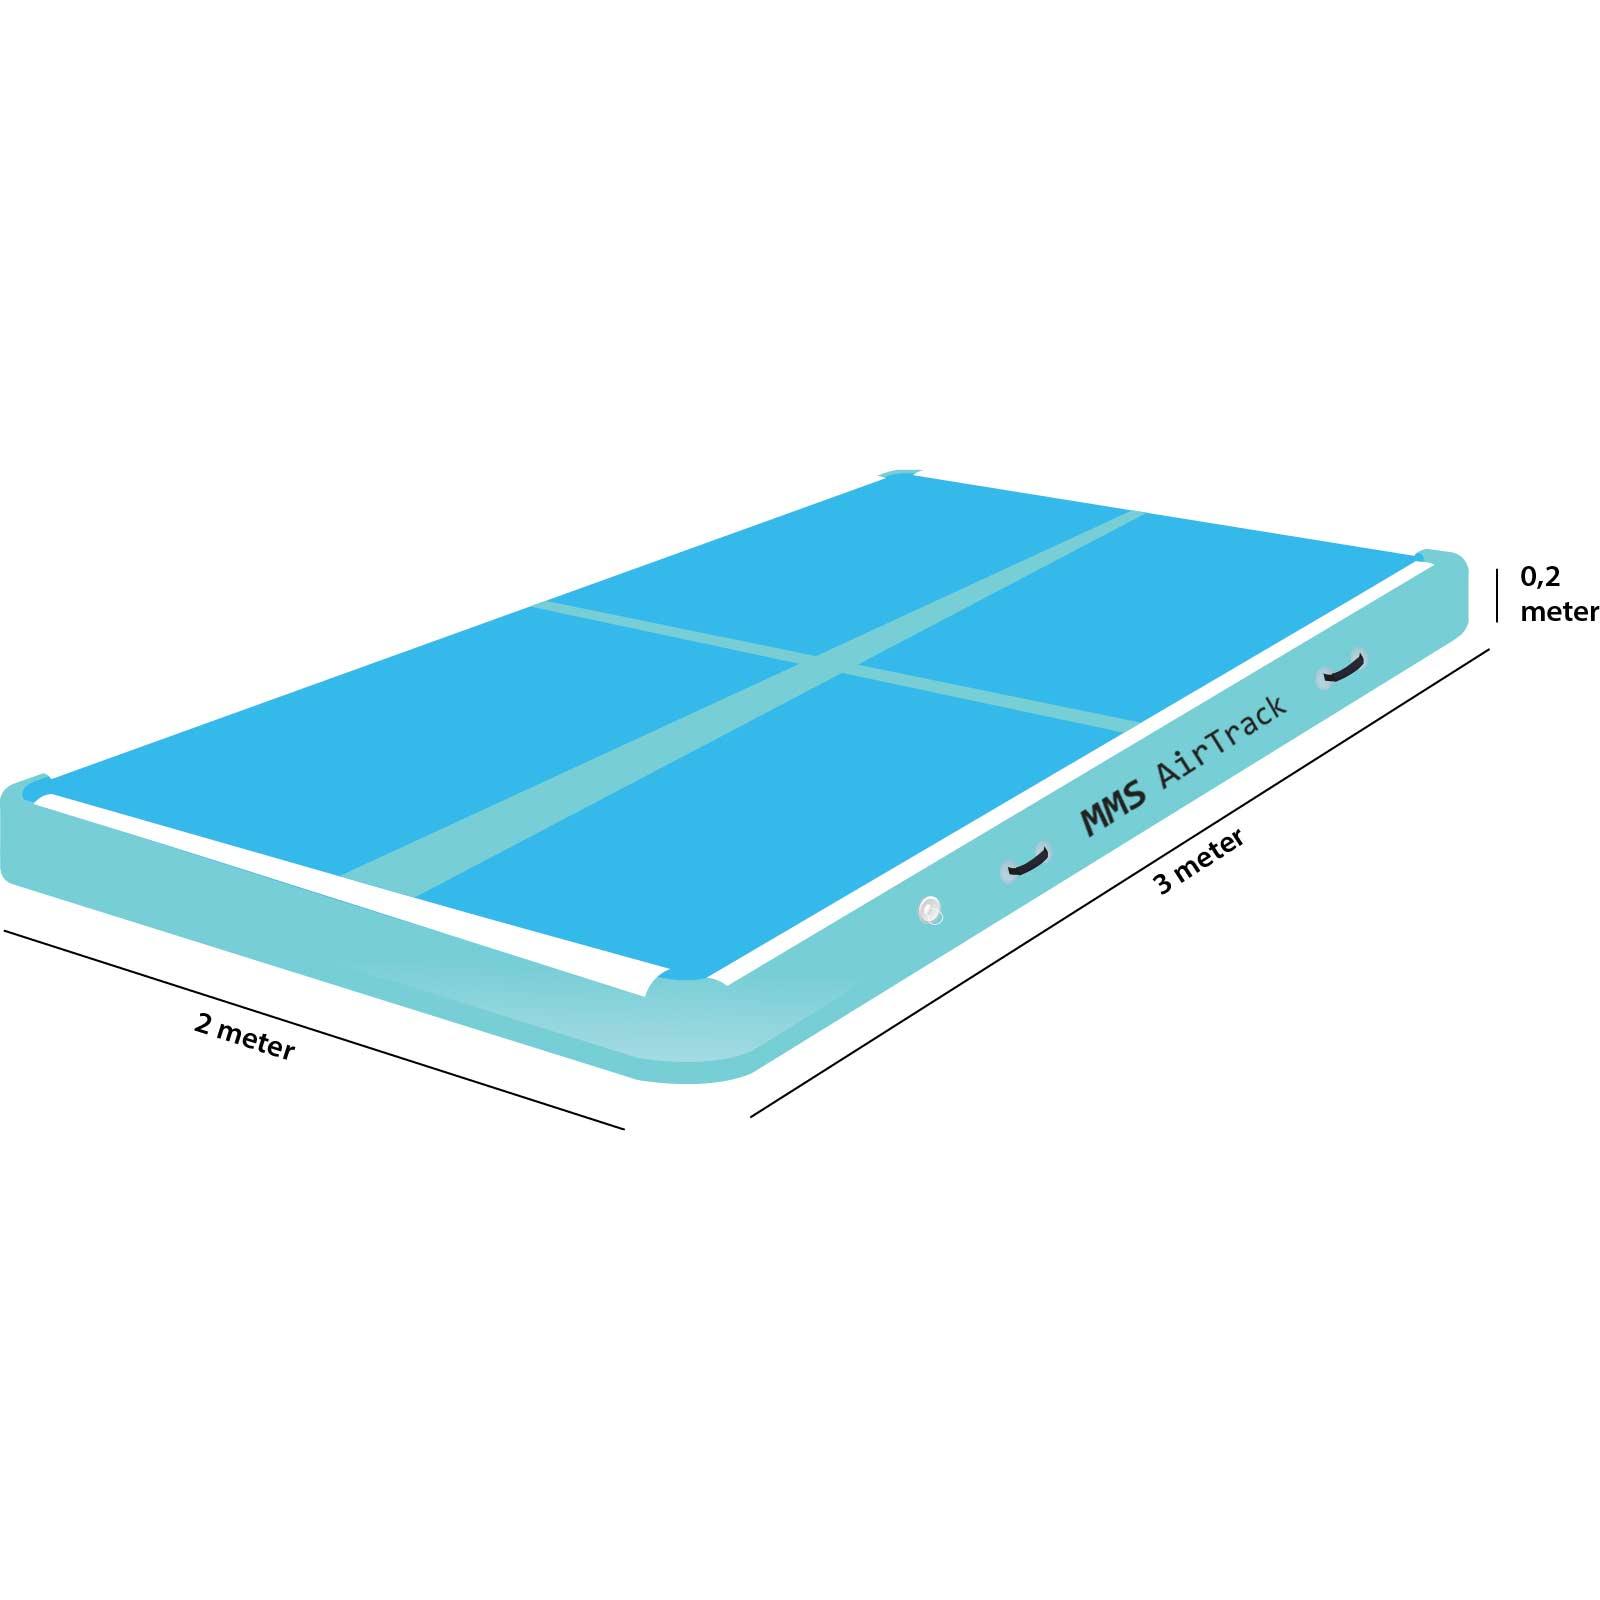 Airtrack 3 meter x 2 x 0,2 blauw